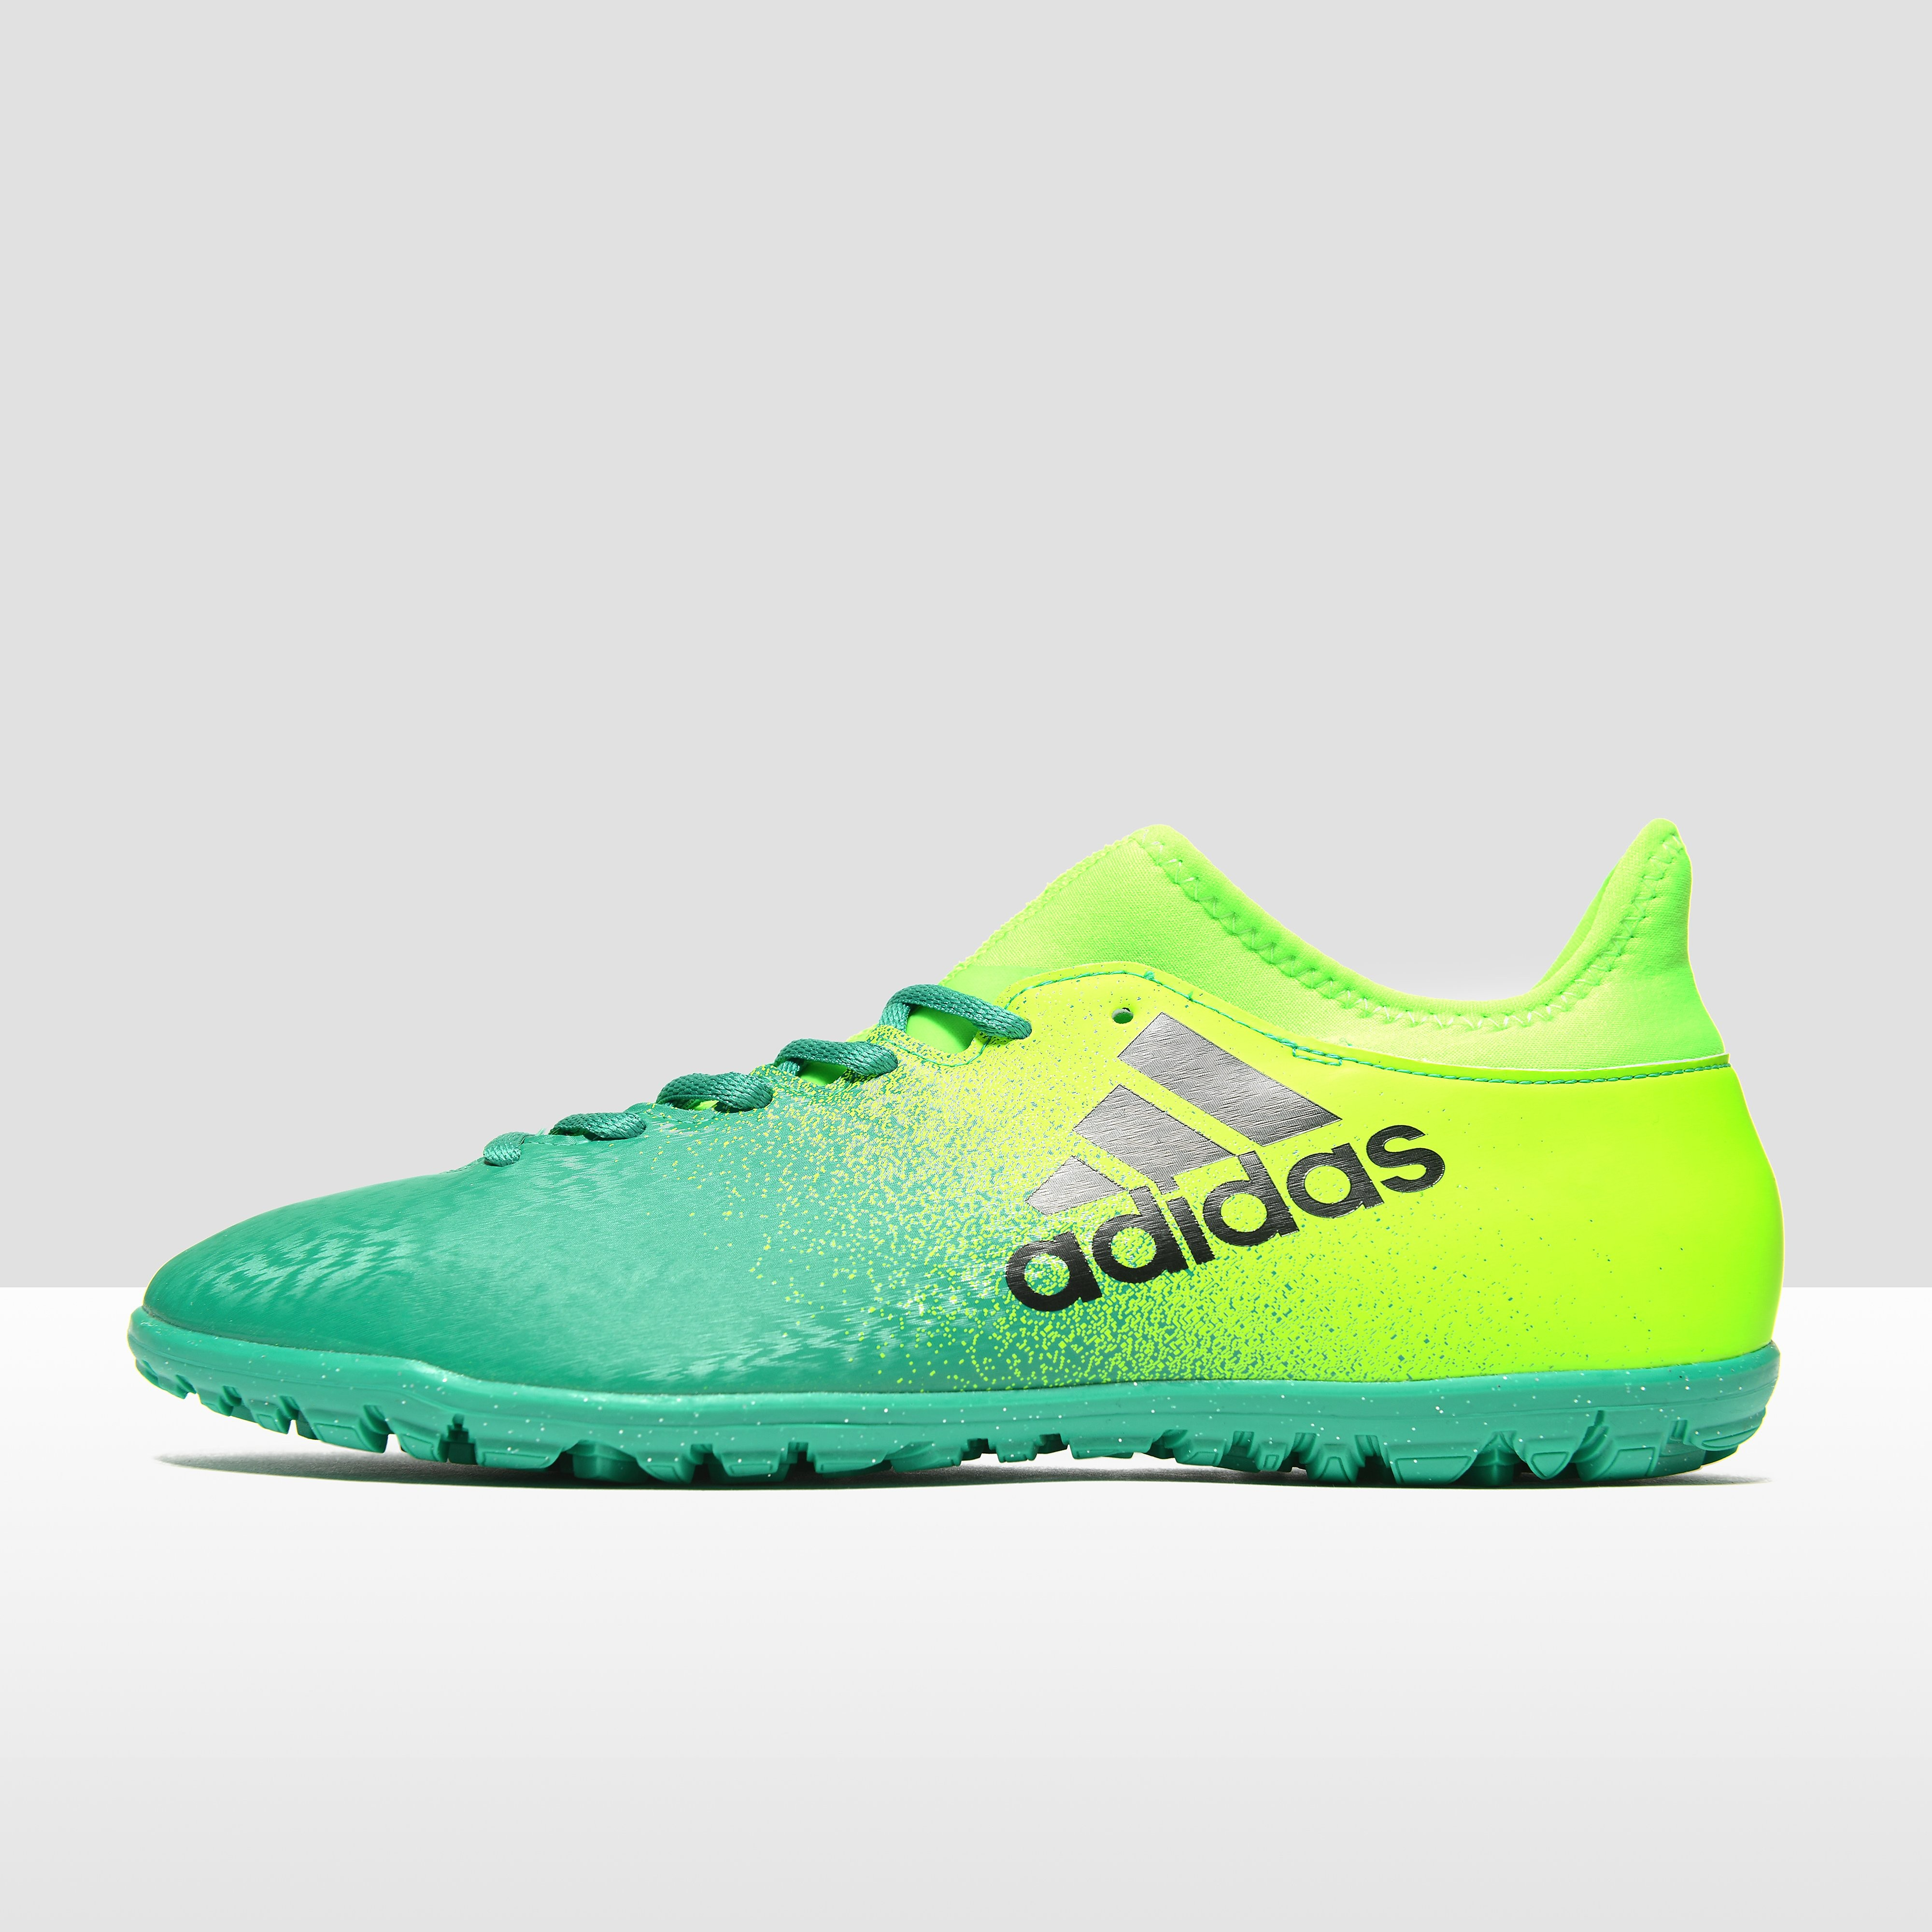 adidas Turbocharge X 16.3 TF Men's Football Boots